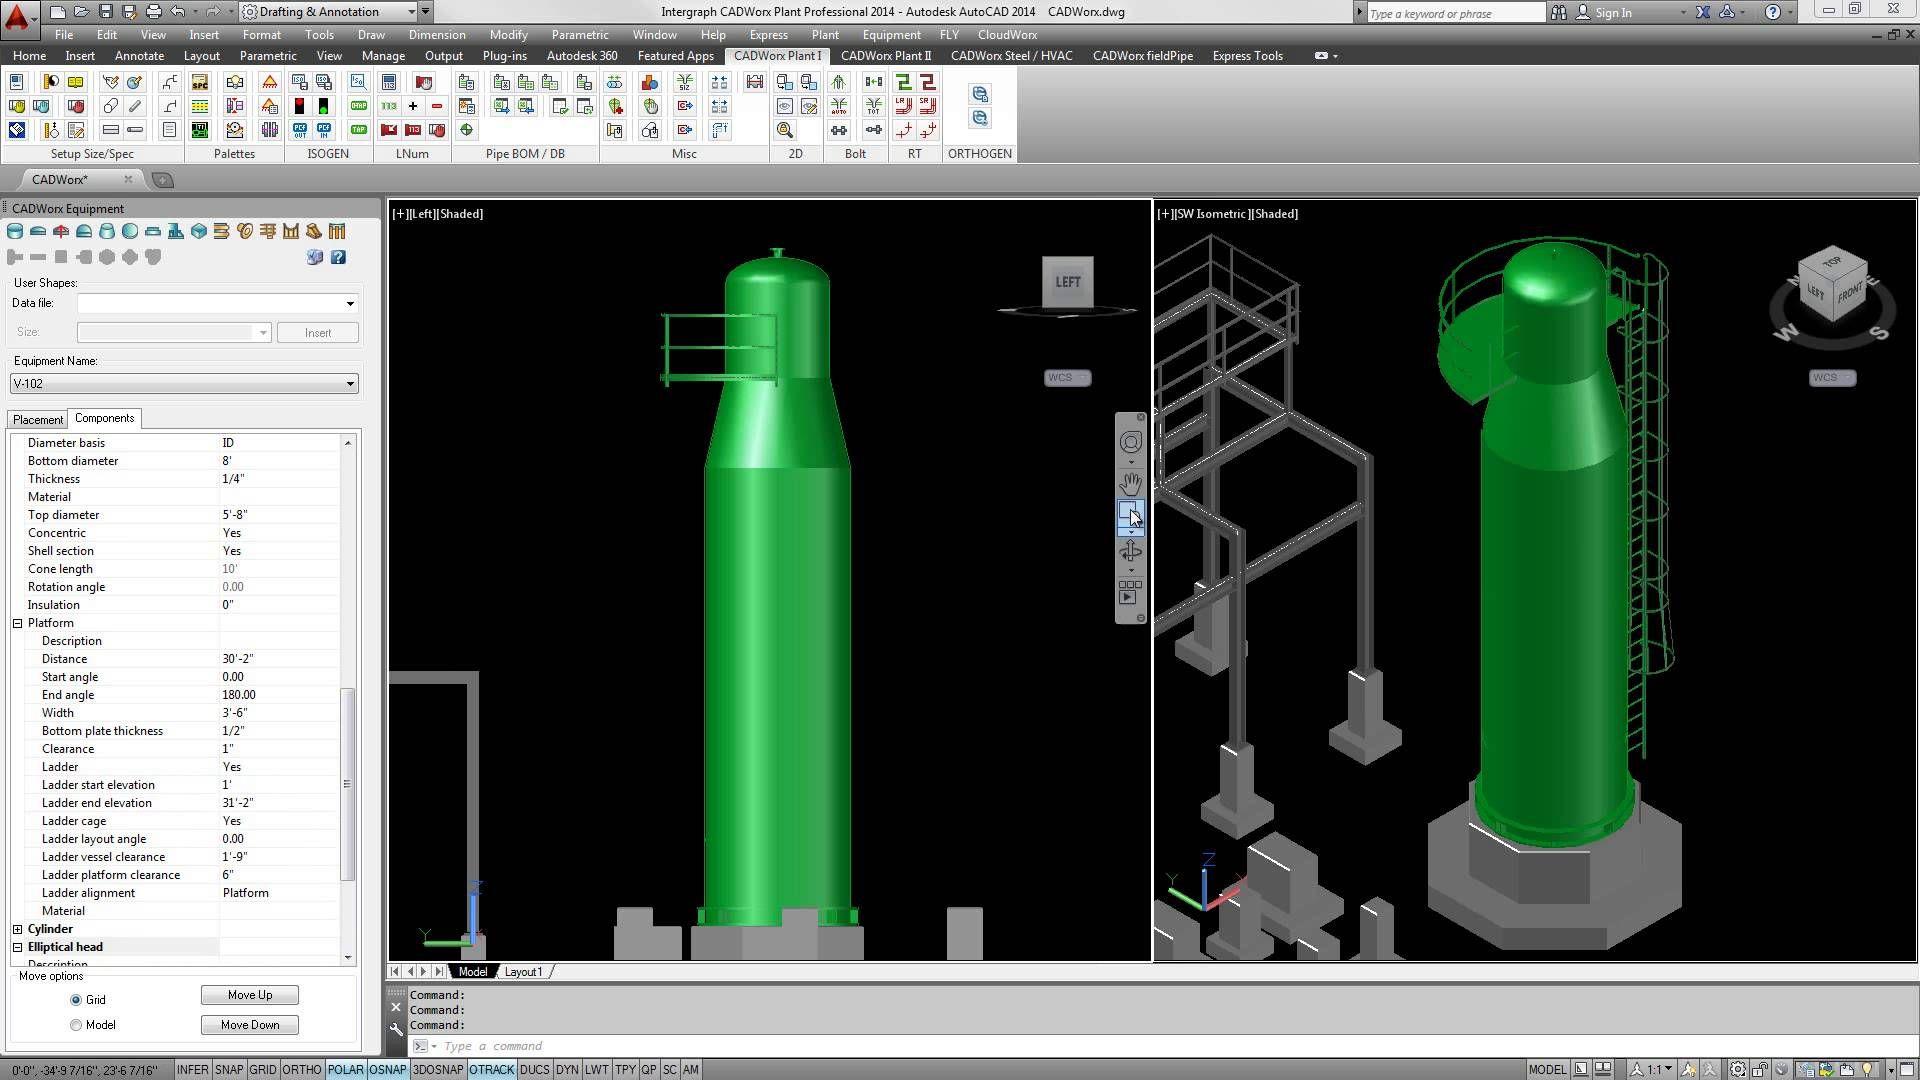 Intergraph CADWorx Plant Professional Equipment Overview